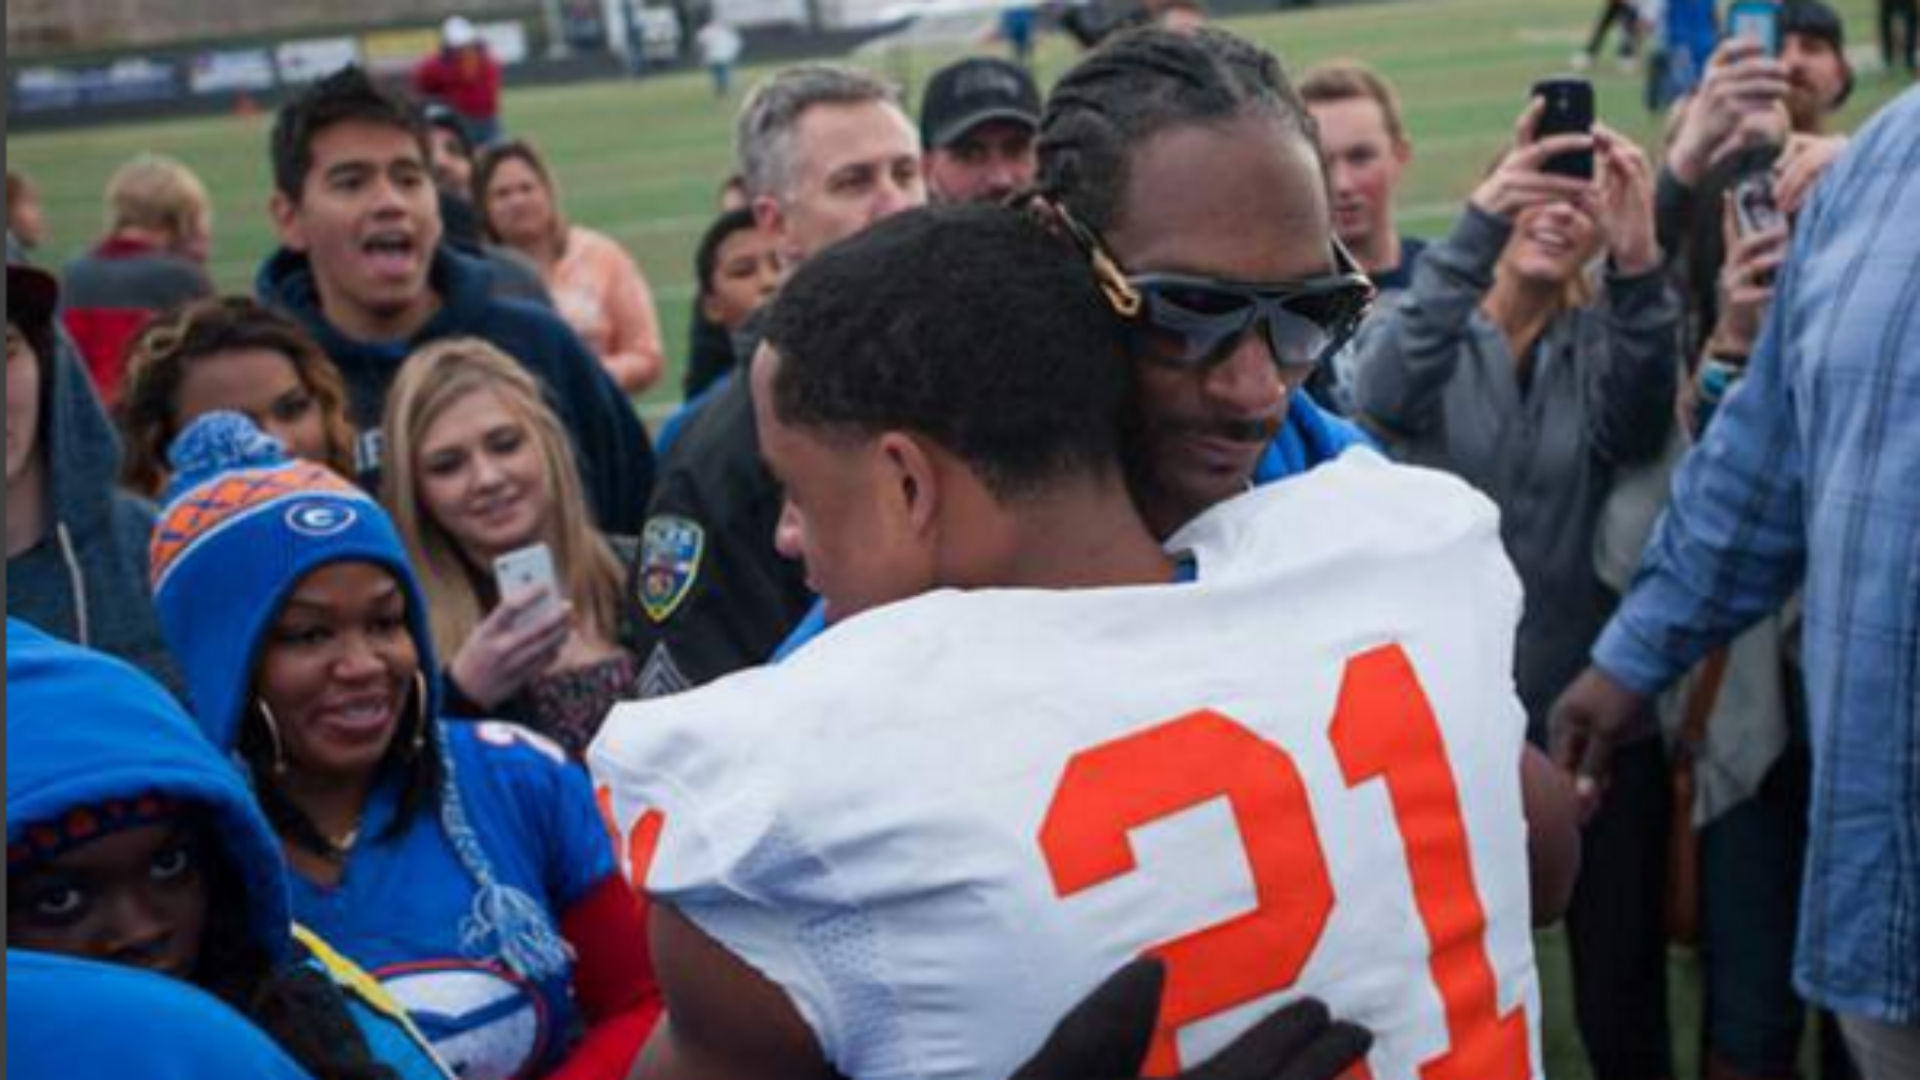 Snoop Dogg Son Football Bishop Gorman Cordell Broadus Bishop Gorman